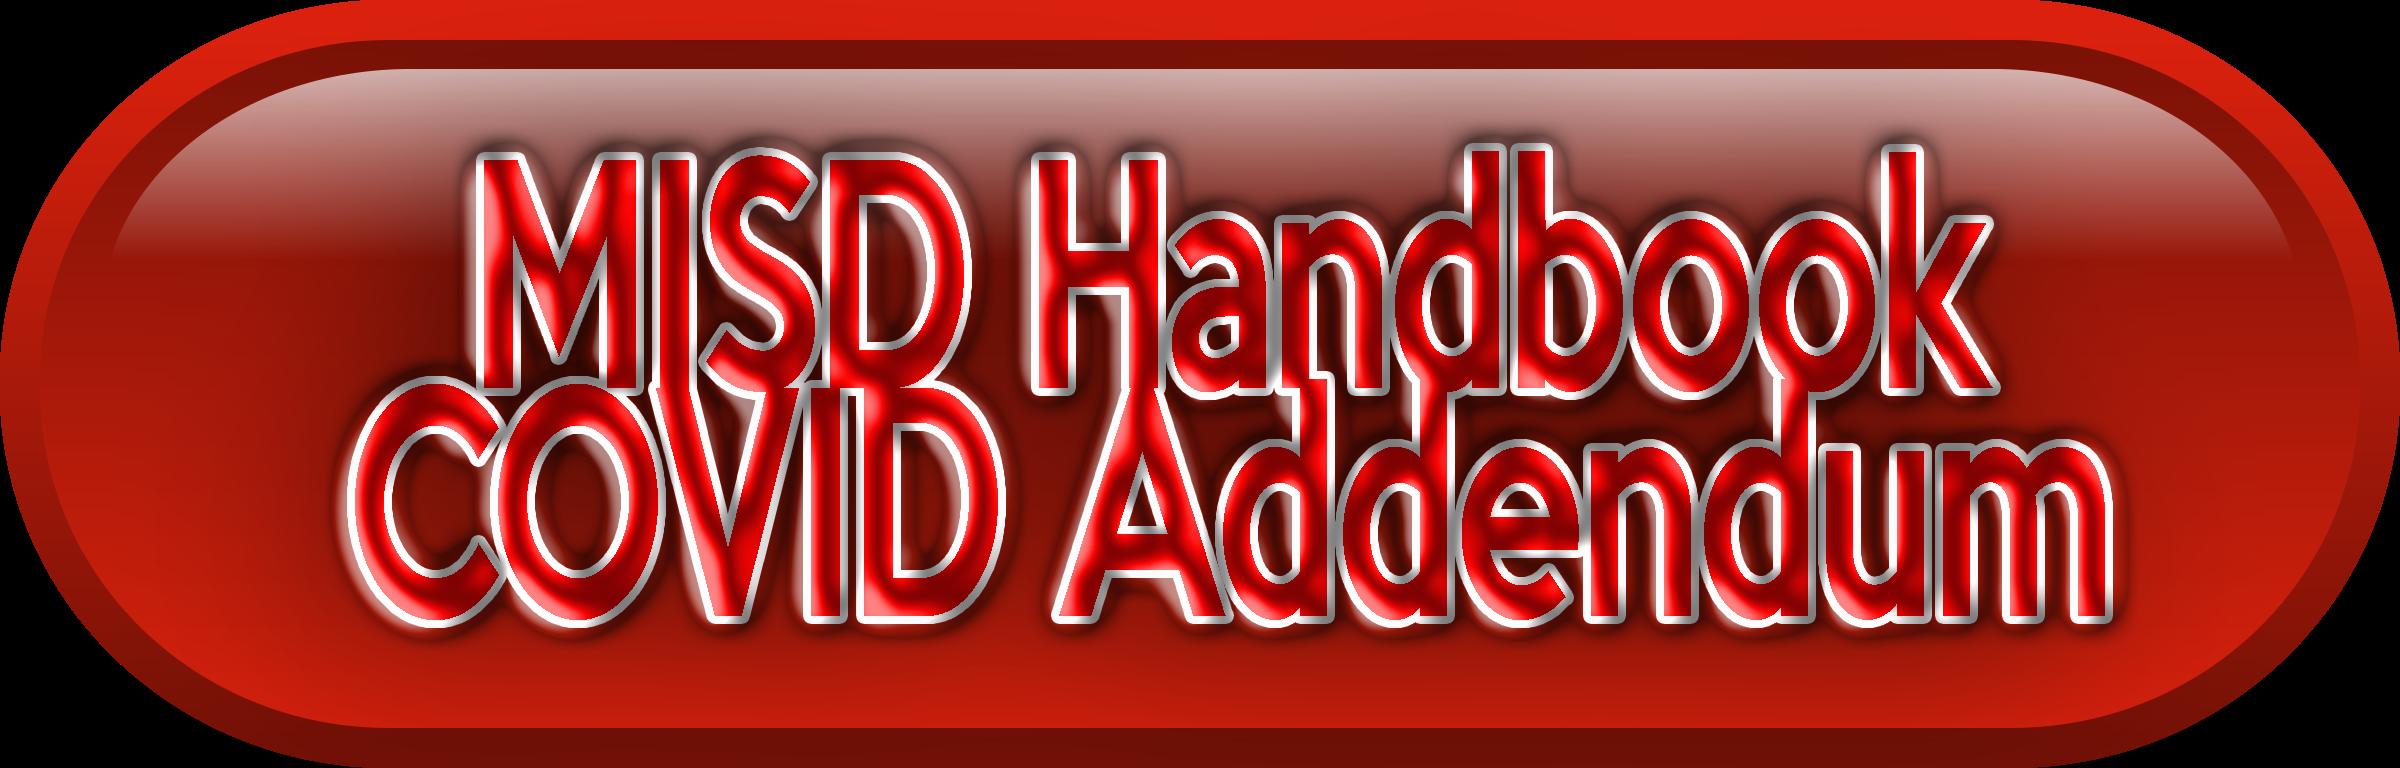 COVID Addendum